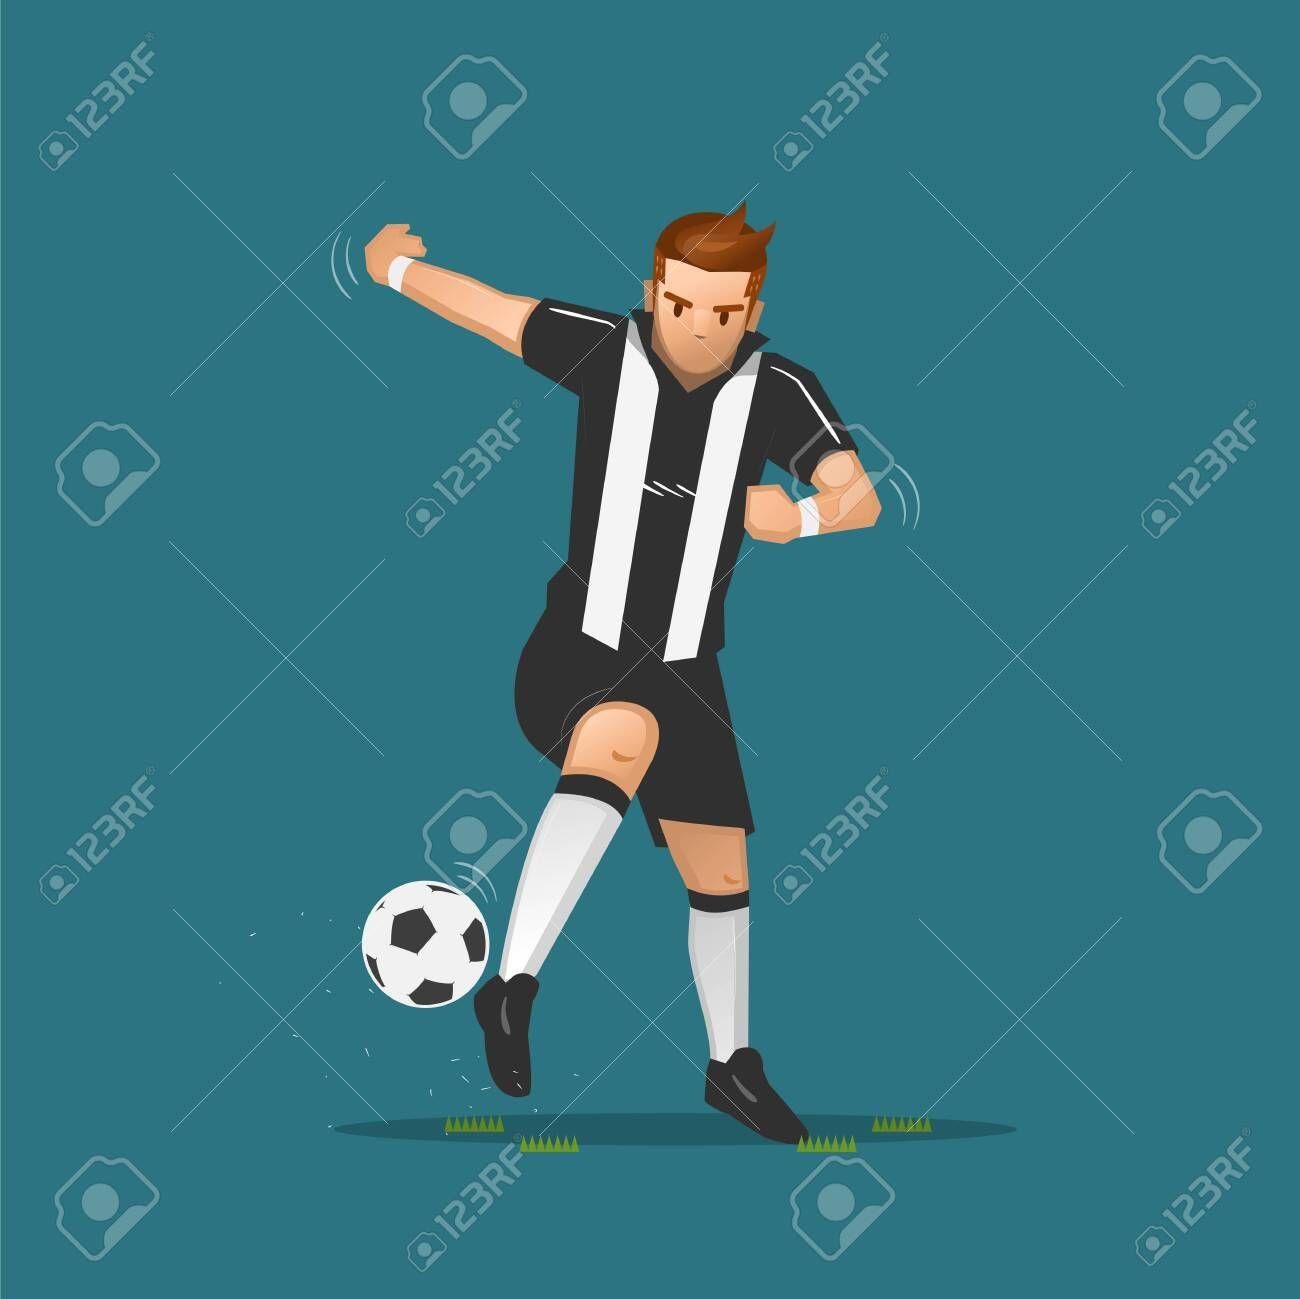 Soccer Player Cartoon Dribbling A Ball On Blue Background Sponsored Cartoon Player Soccer Drib Social Media Strategies Soccer Players Media Strategy